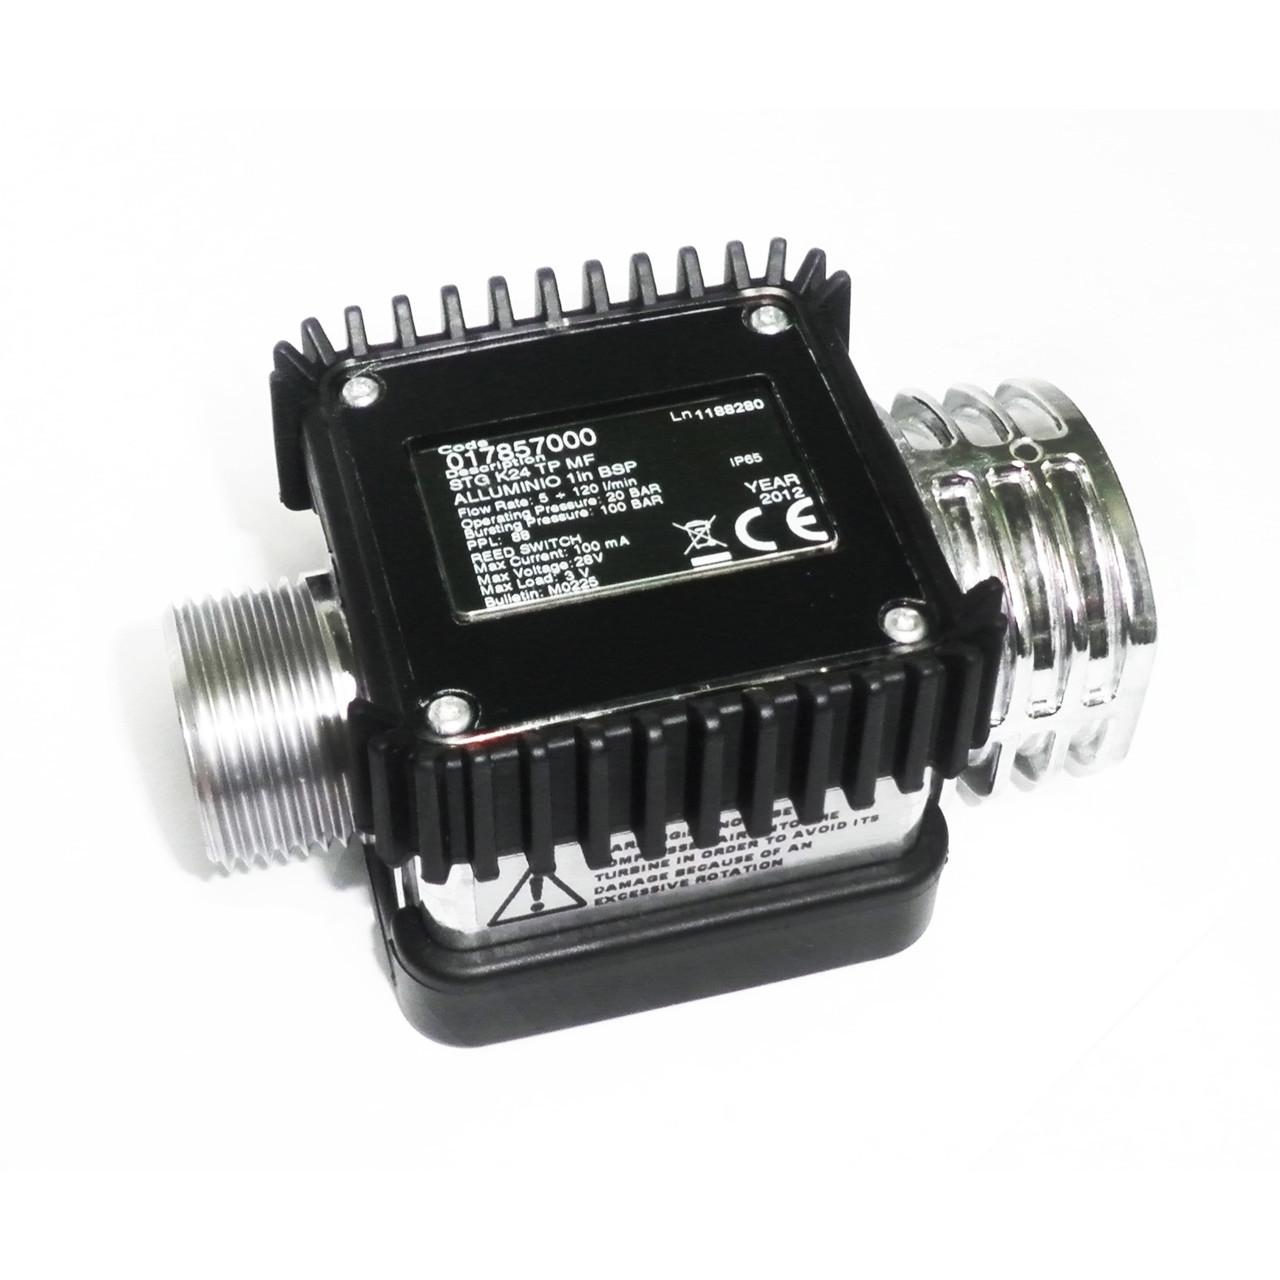 Счетчики PIUSI K24 PULSER для дизельного топлива